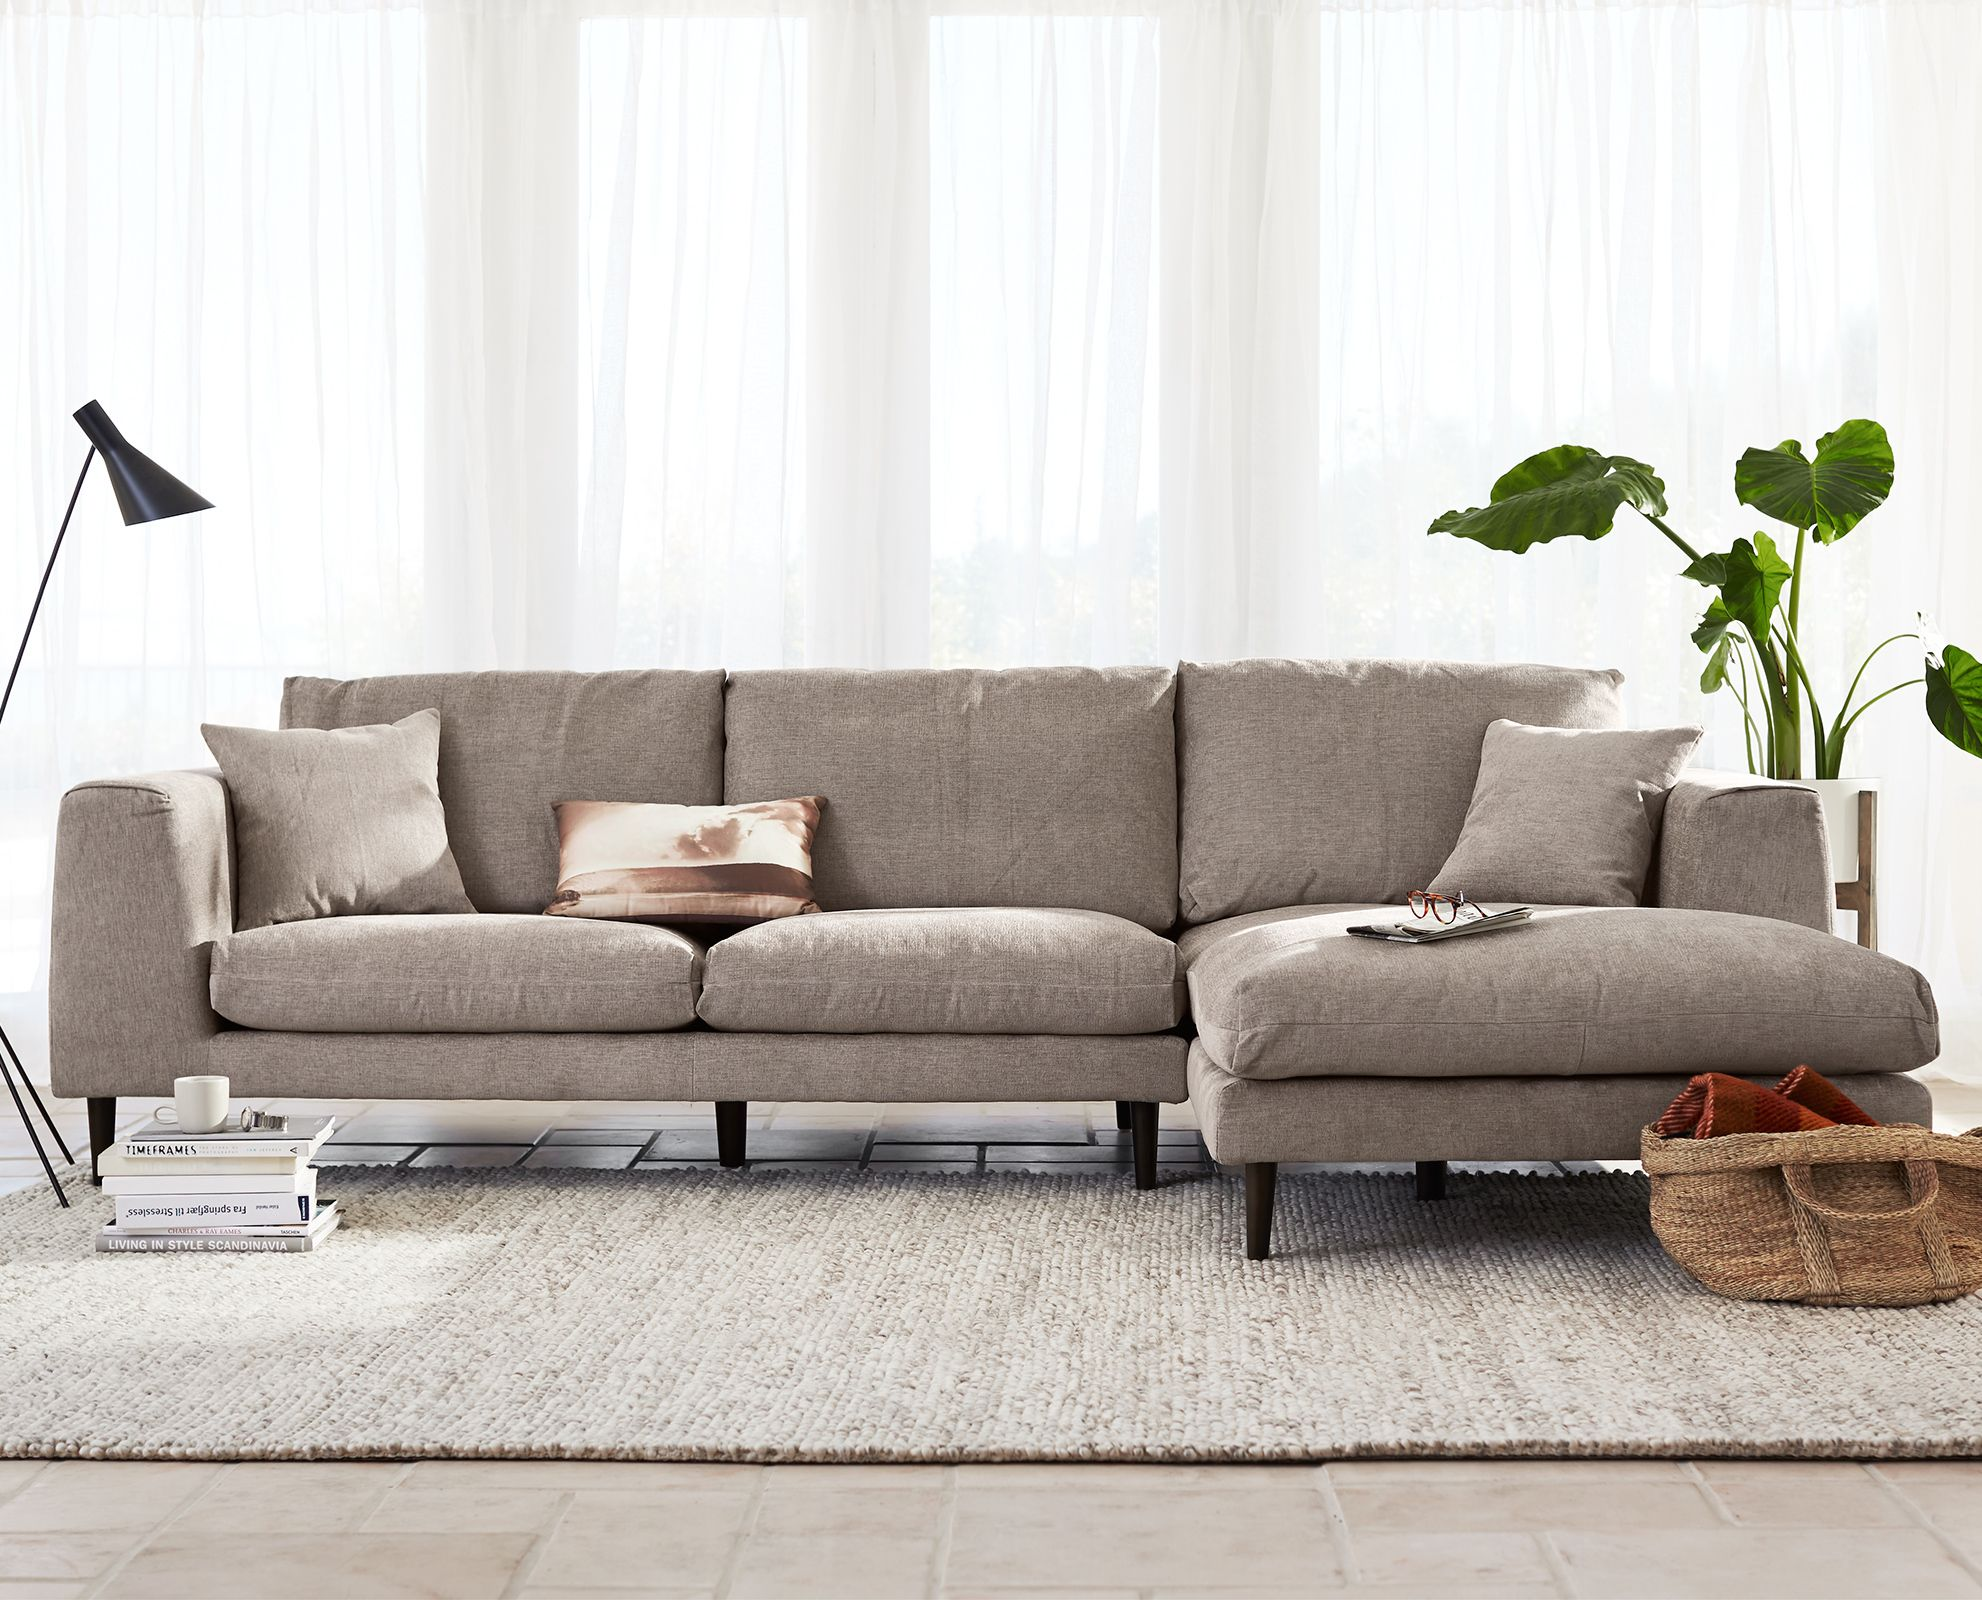 scandinavian design sofa singapore padstow laura ashley jorgen chaise sectional great option different color